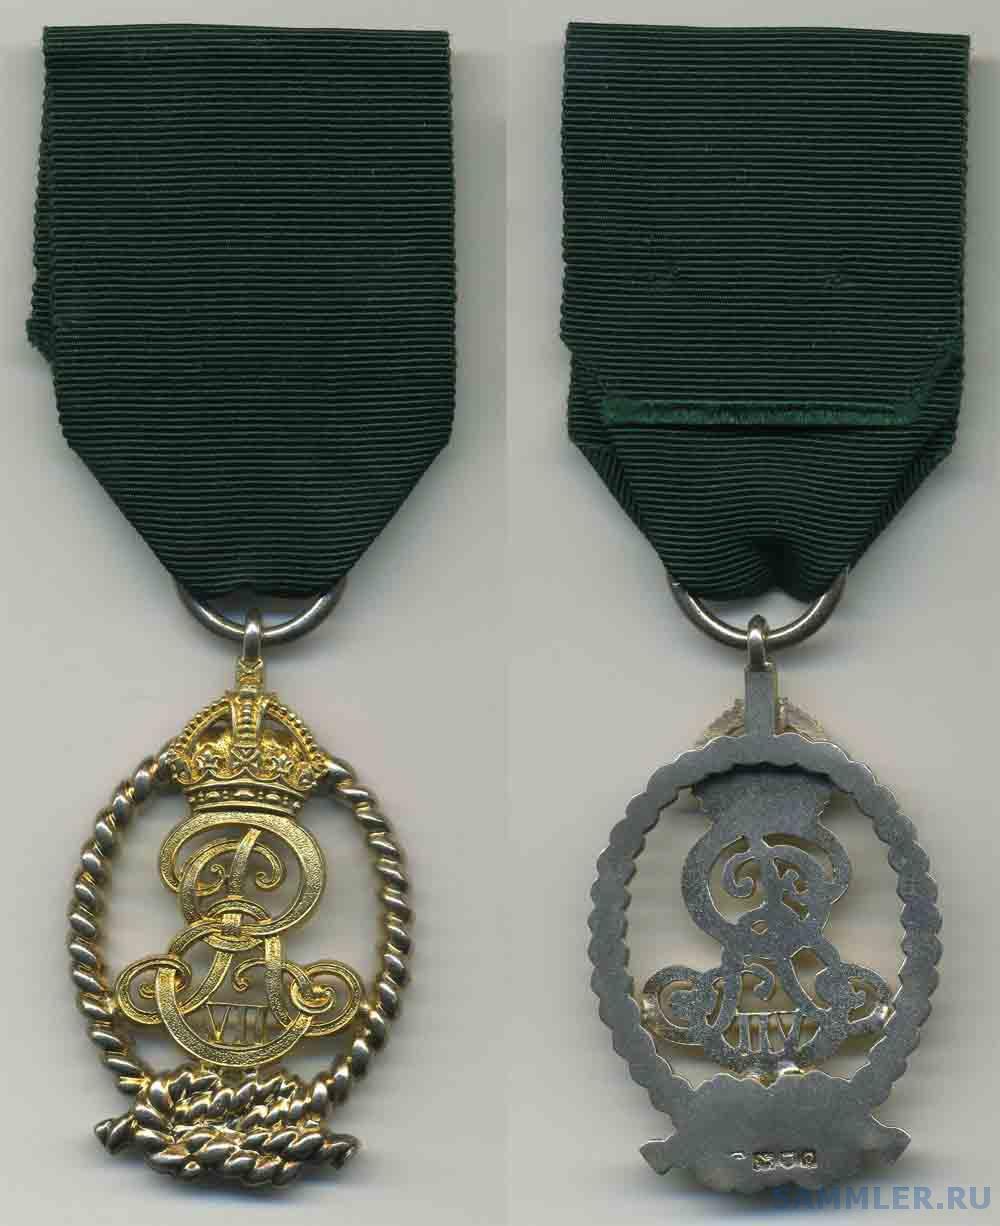 Royal Naval Reserve Decoration (E VII).jpg